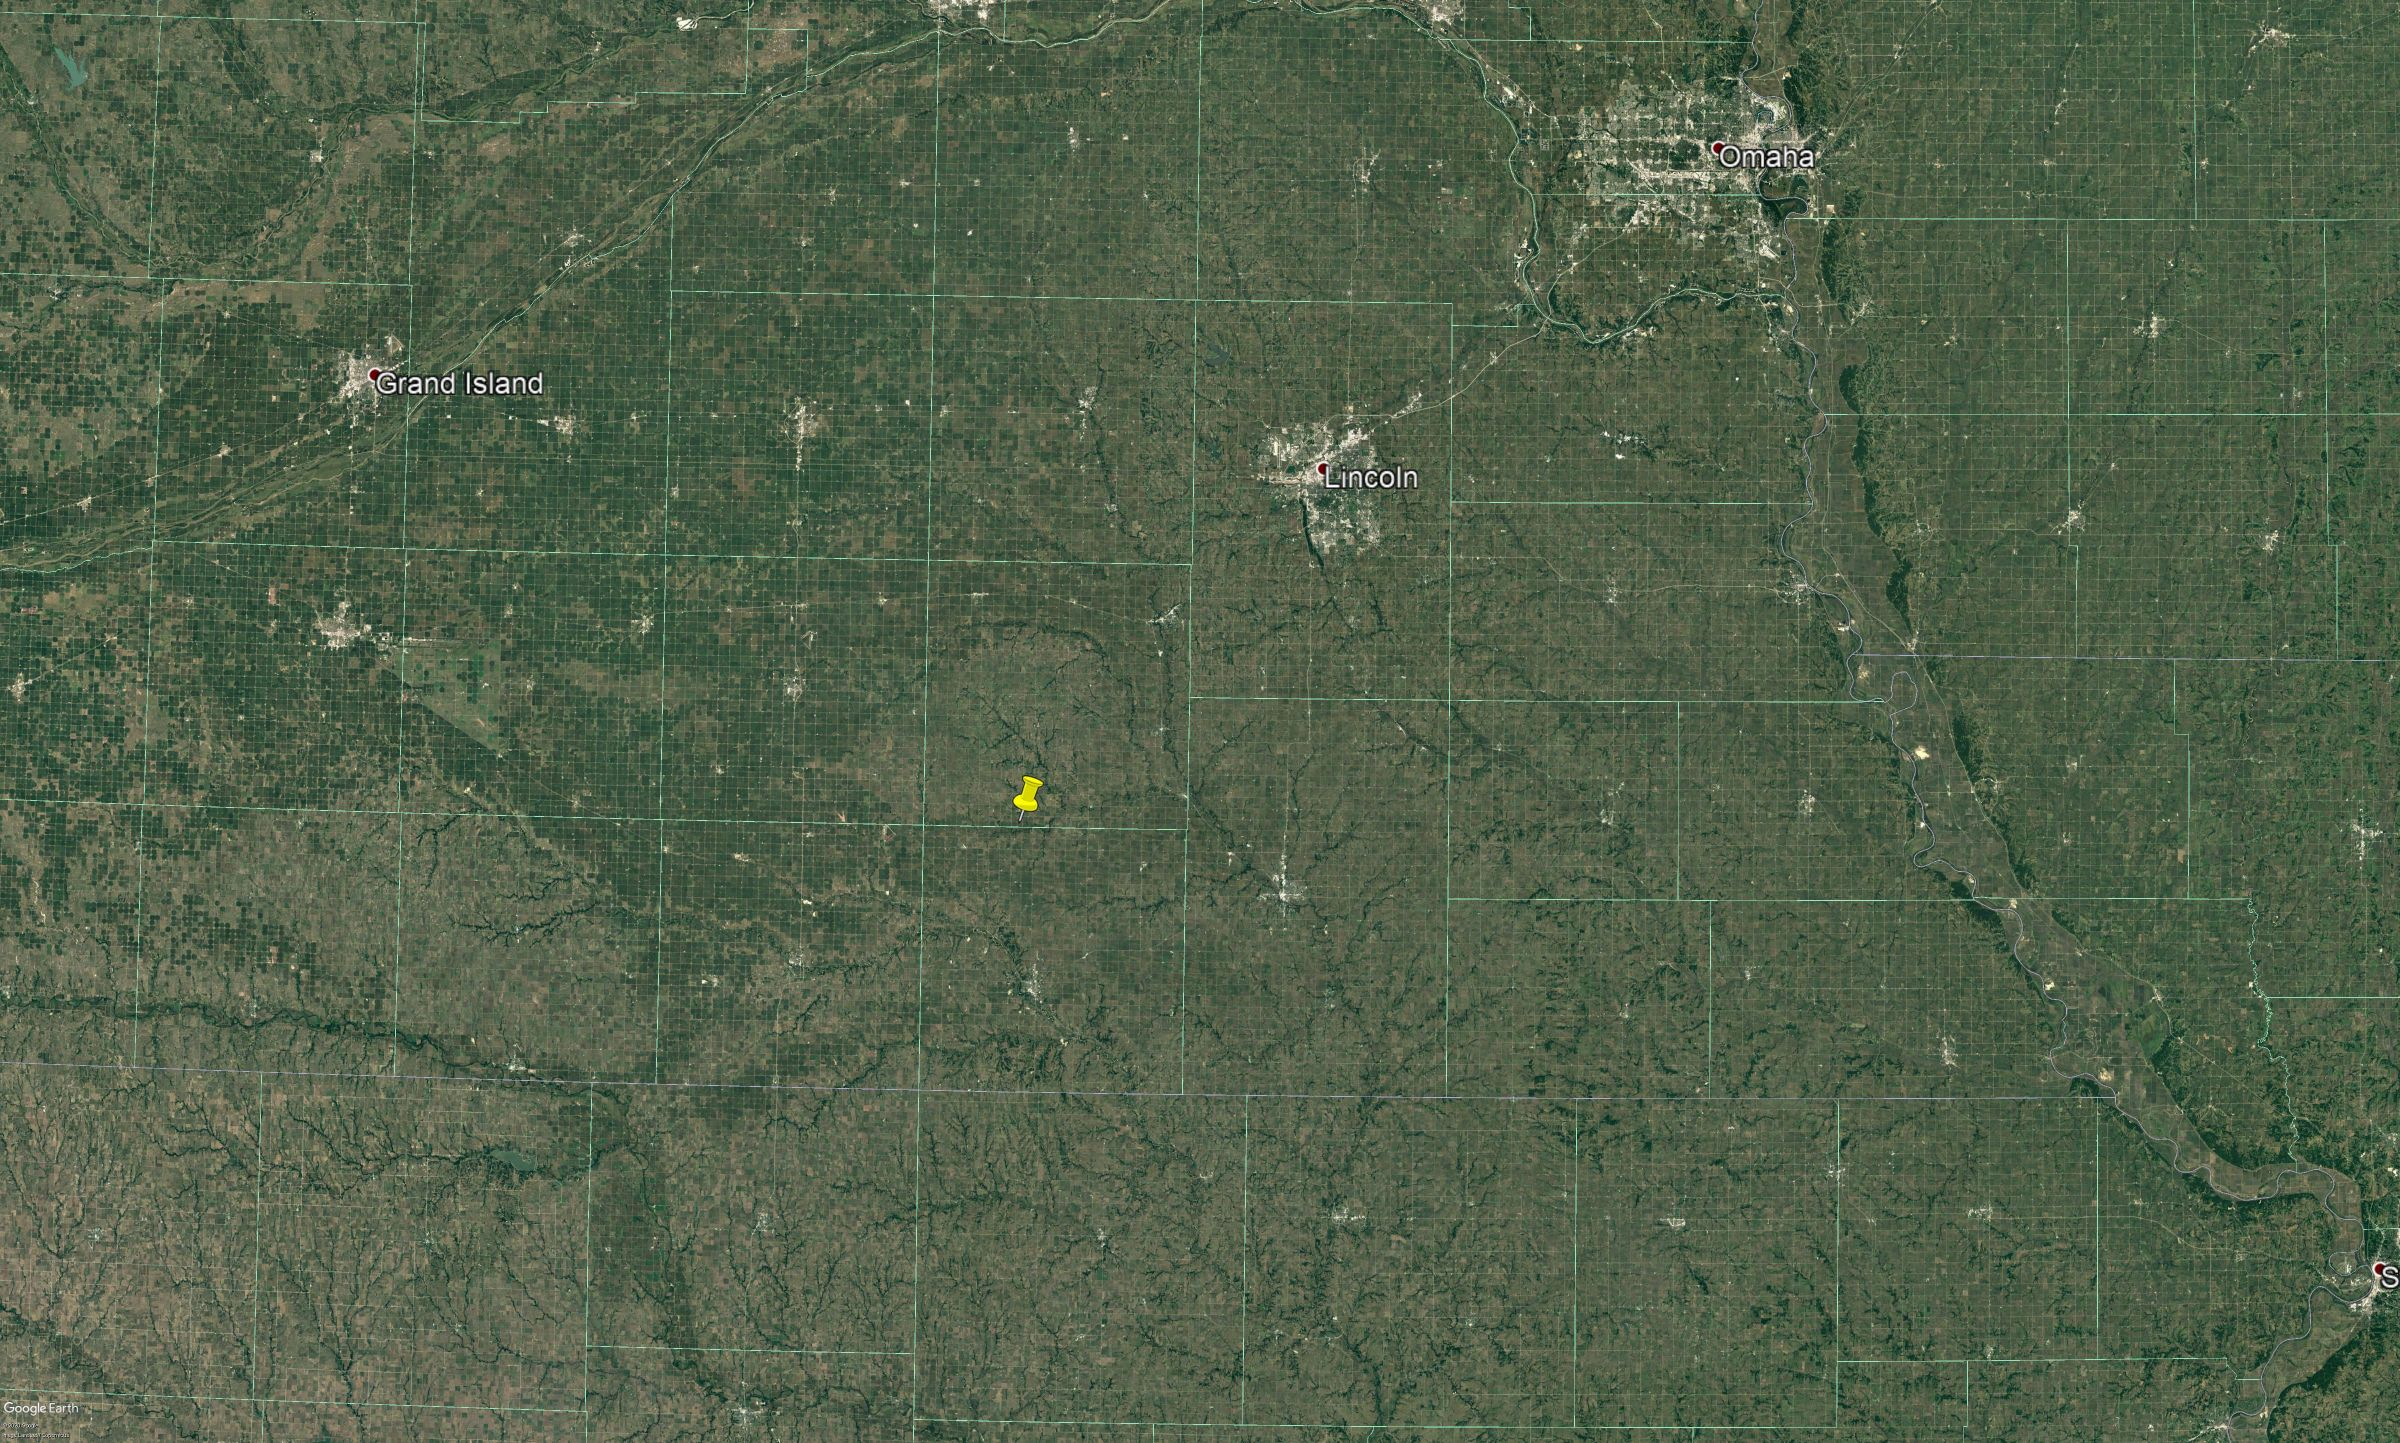 14867-1900-county-road-y-western-68464-0-2020-02-20-171024.jpg